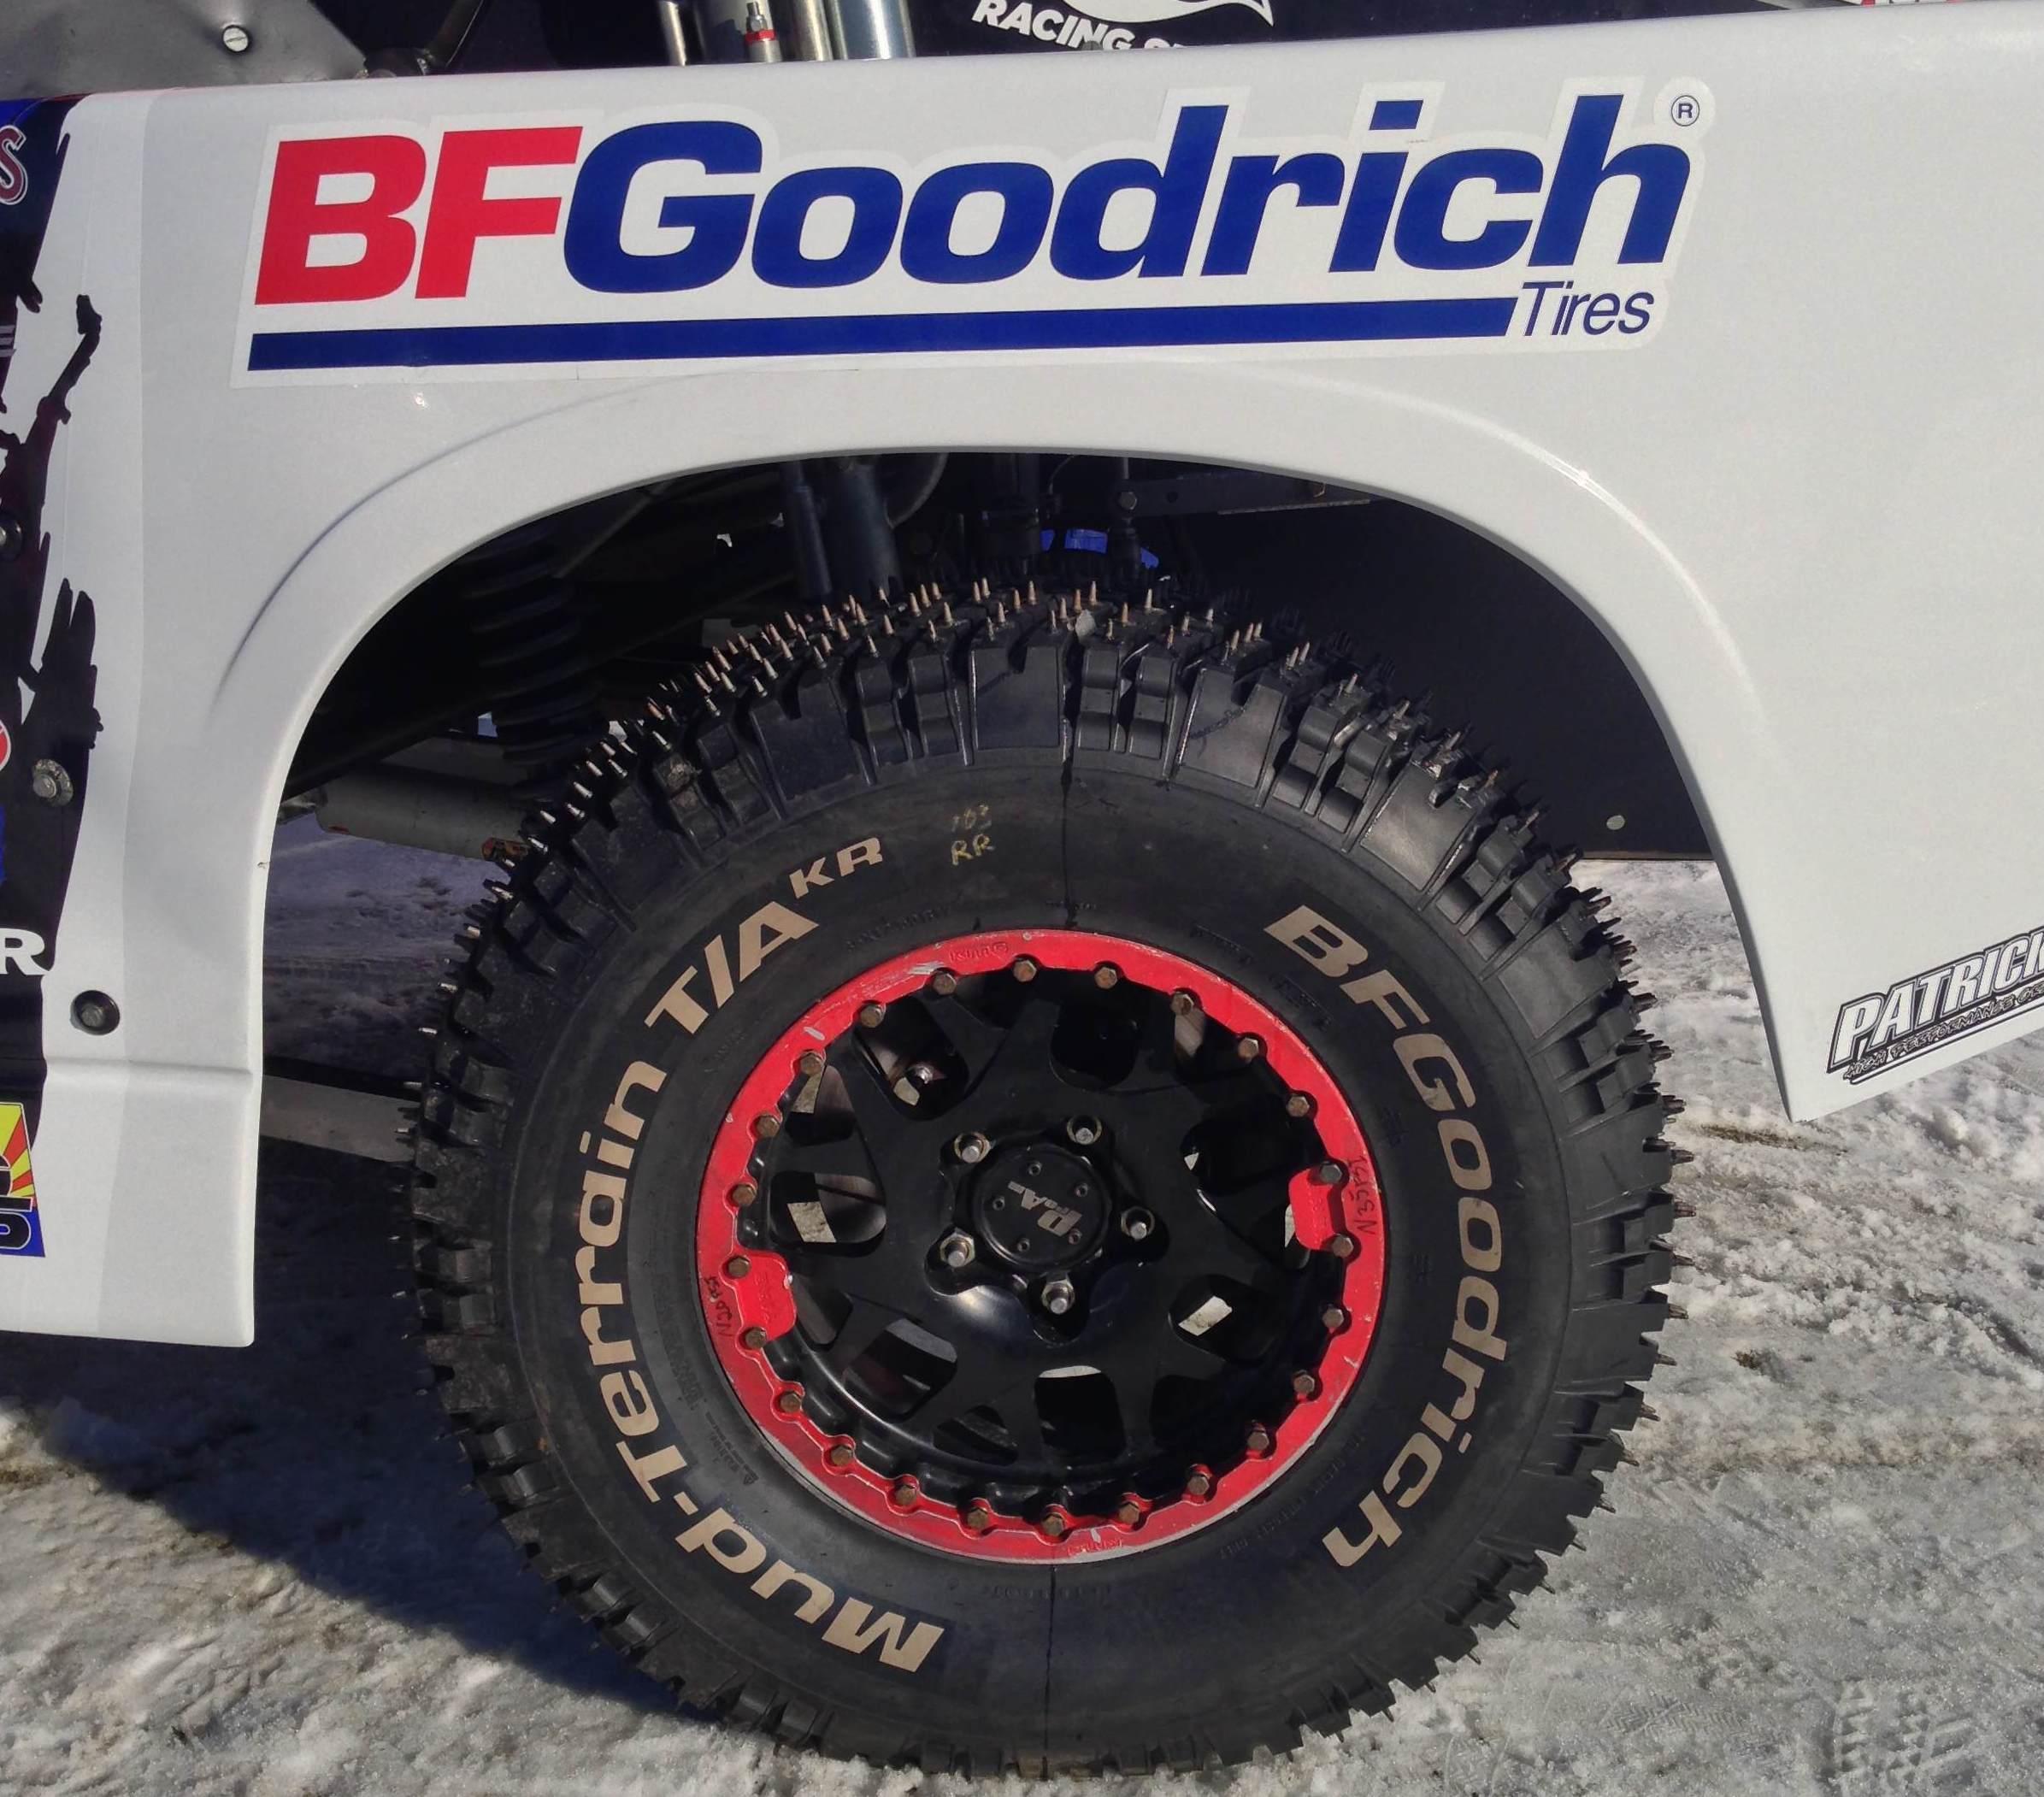 bfgoodrich tires returns to partner with red bull for. Black Bedroom Furniture Sets. Home Design Ideas